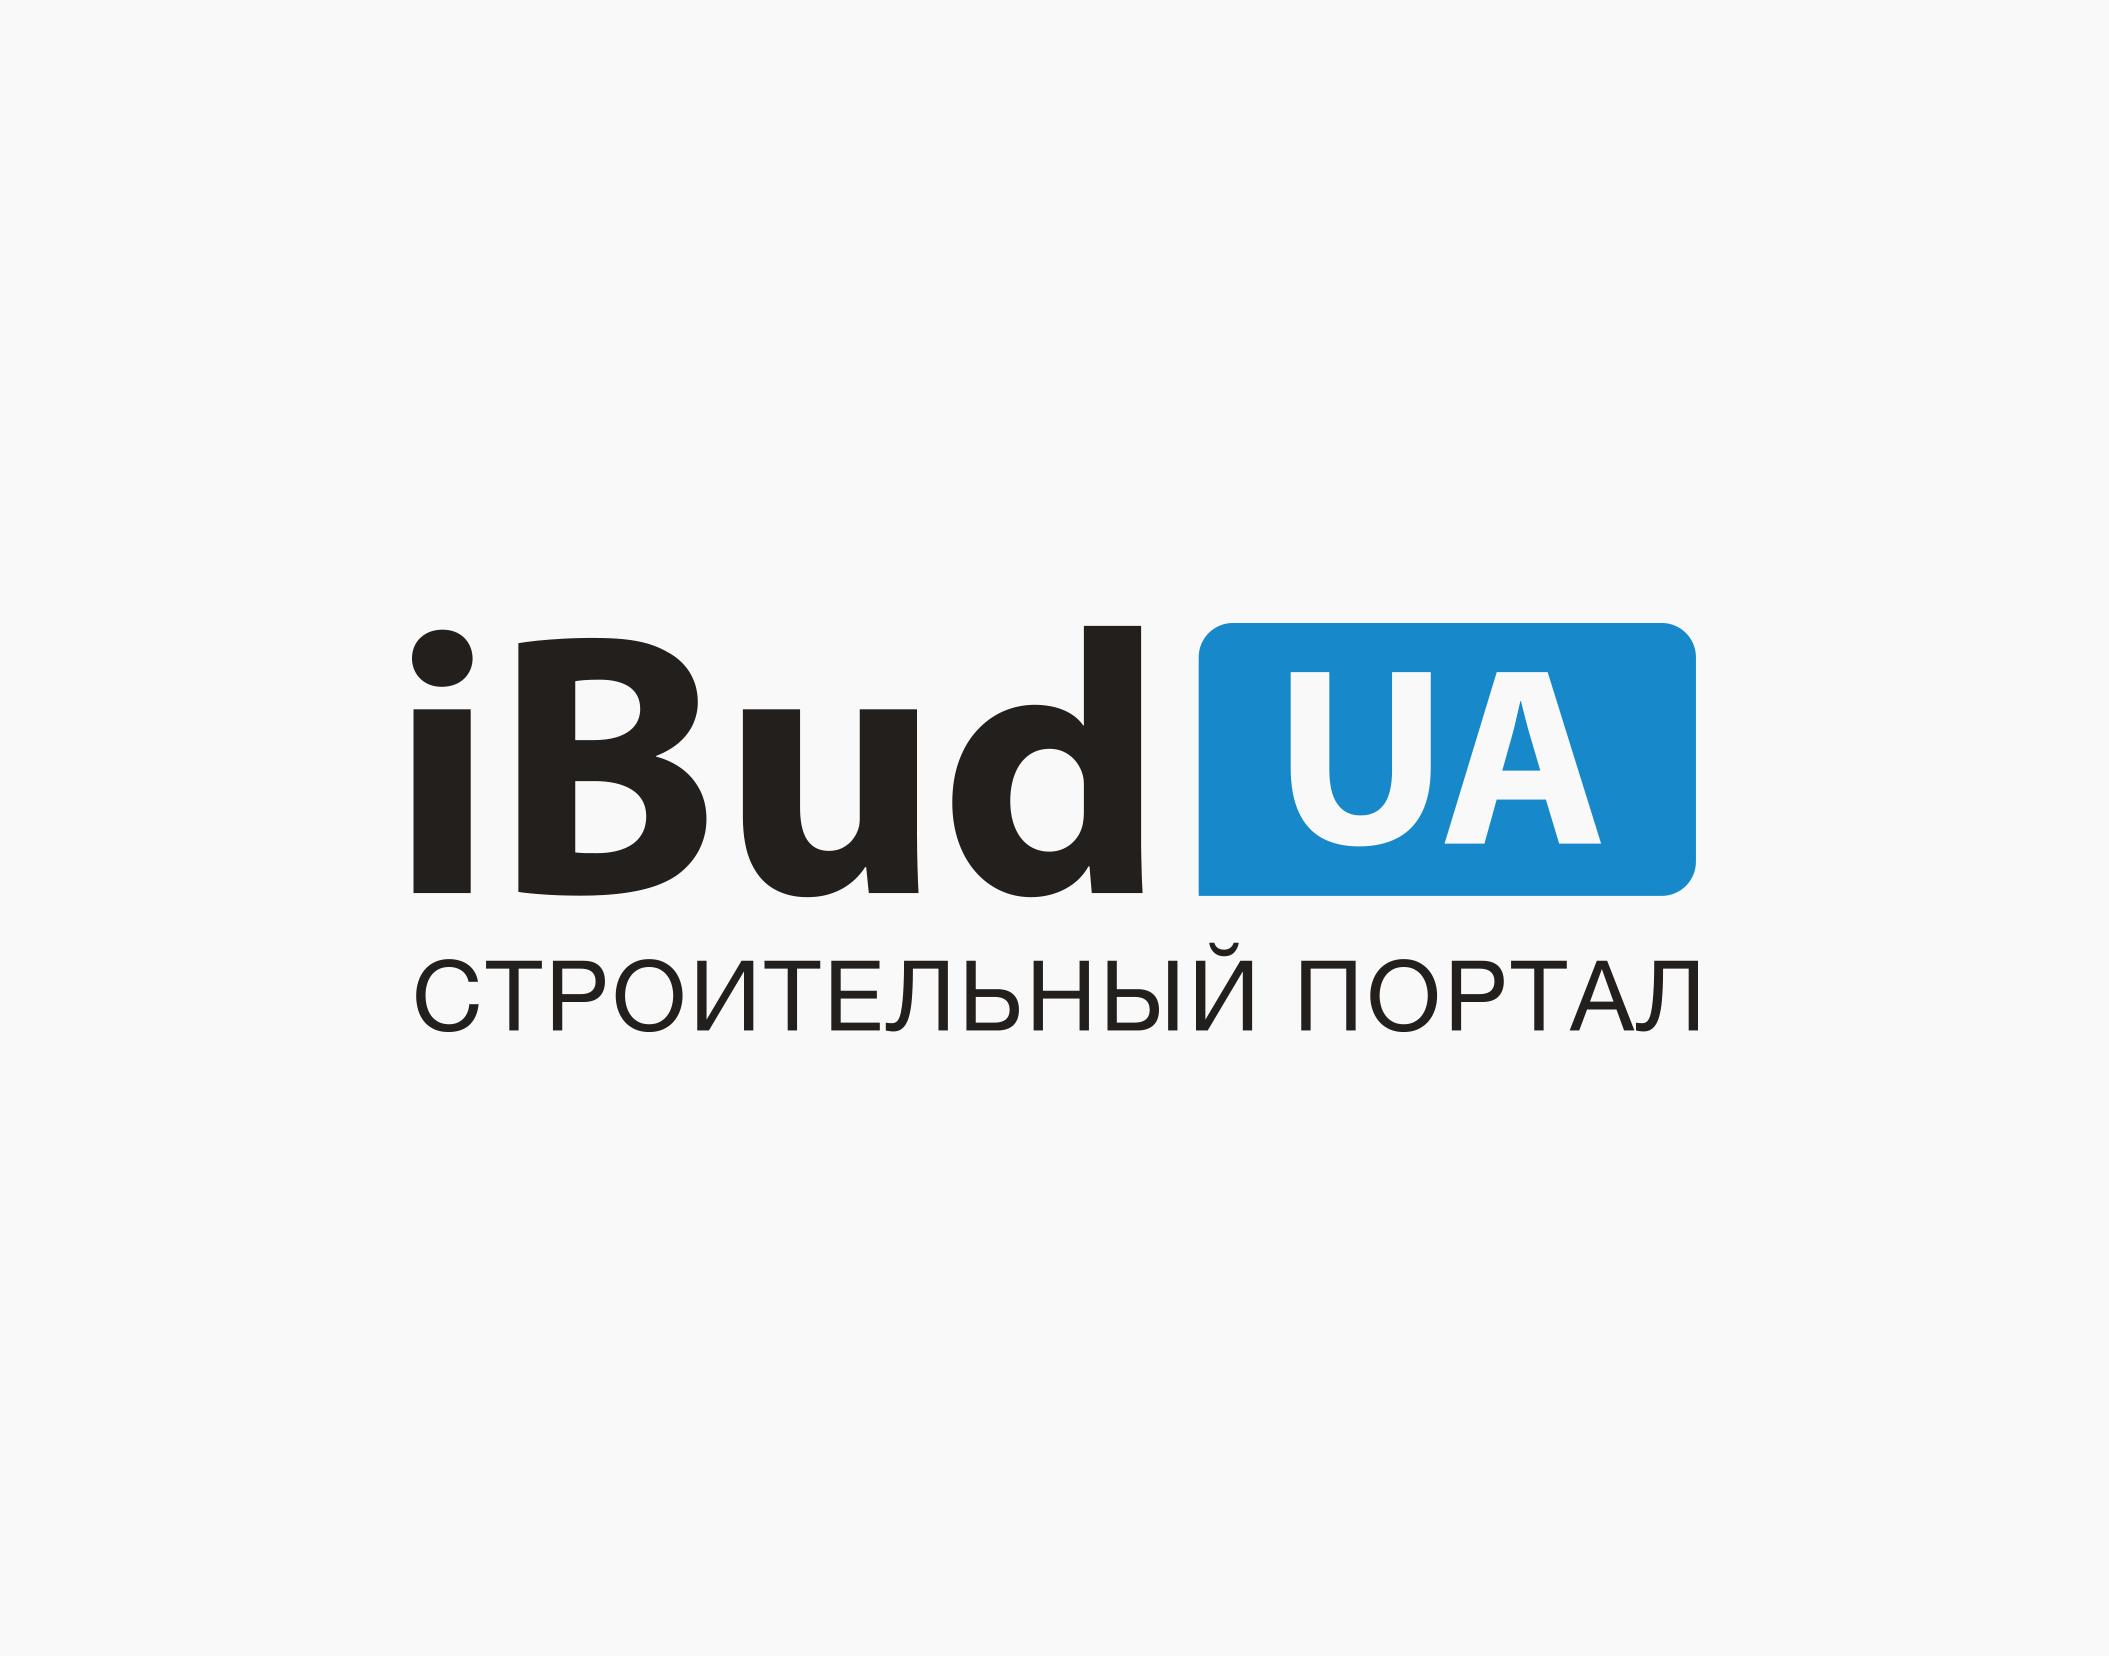 Invitations for iBud.ua